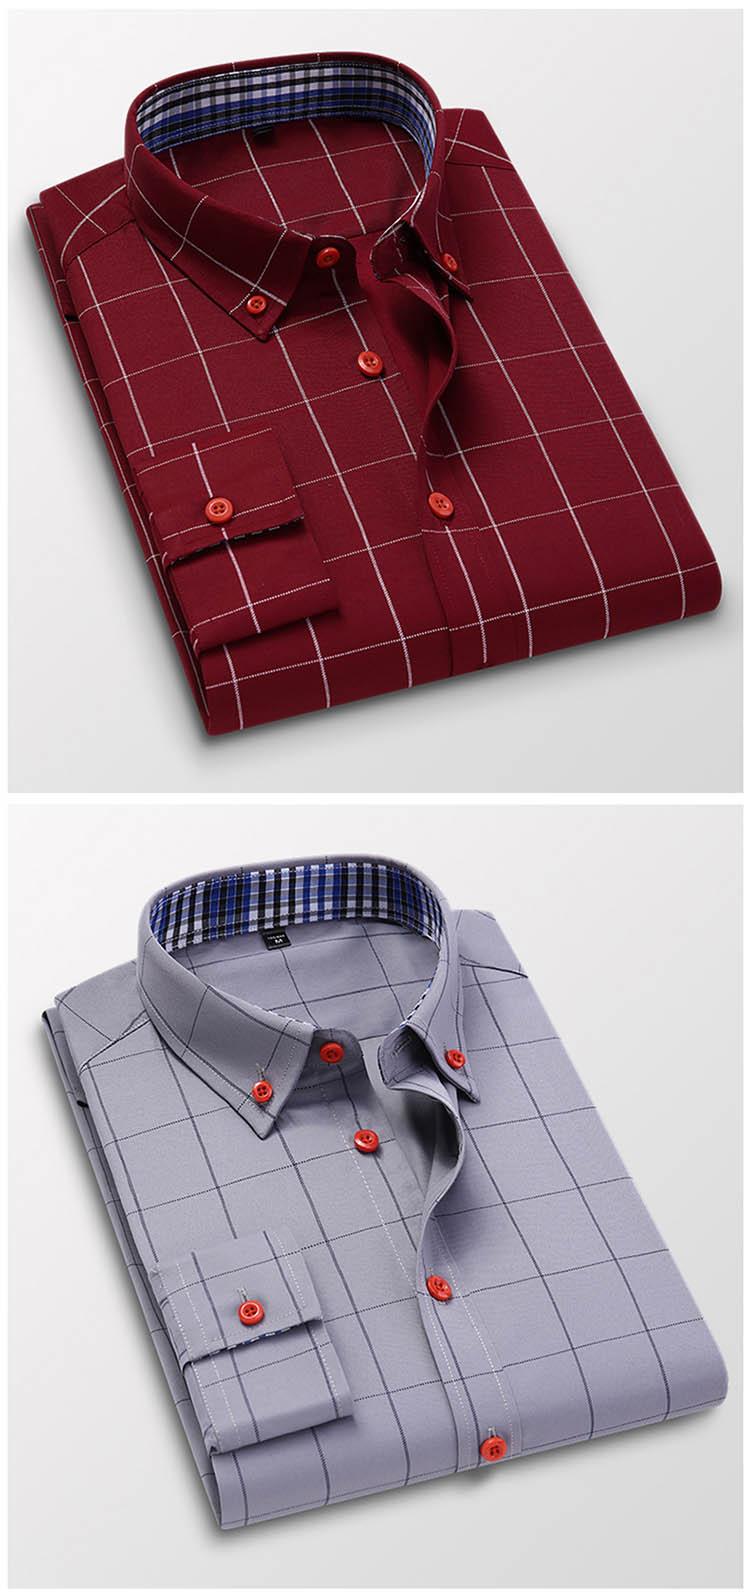 H99f04259910240aba168aa2f3f2f3b56A Handsome Fashion Men Shirts Casual Long Sleeved Plaid Shirt Regular Fit Male Blouse 4XL 5XL